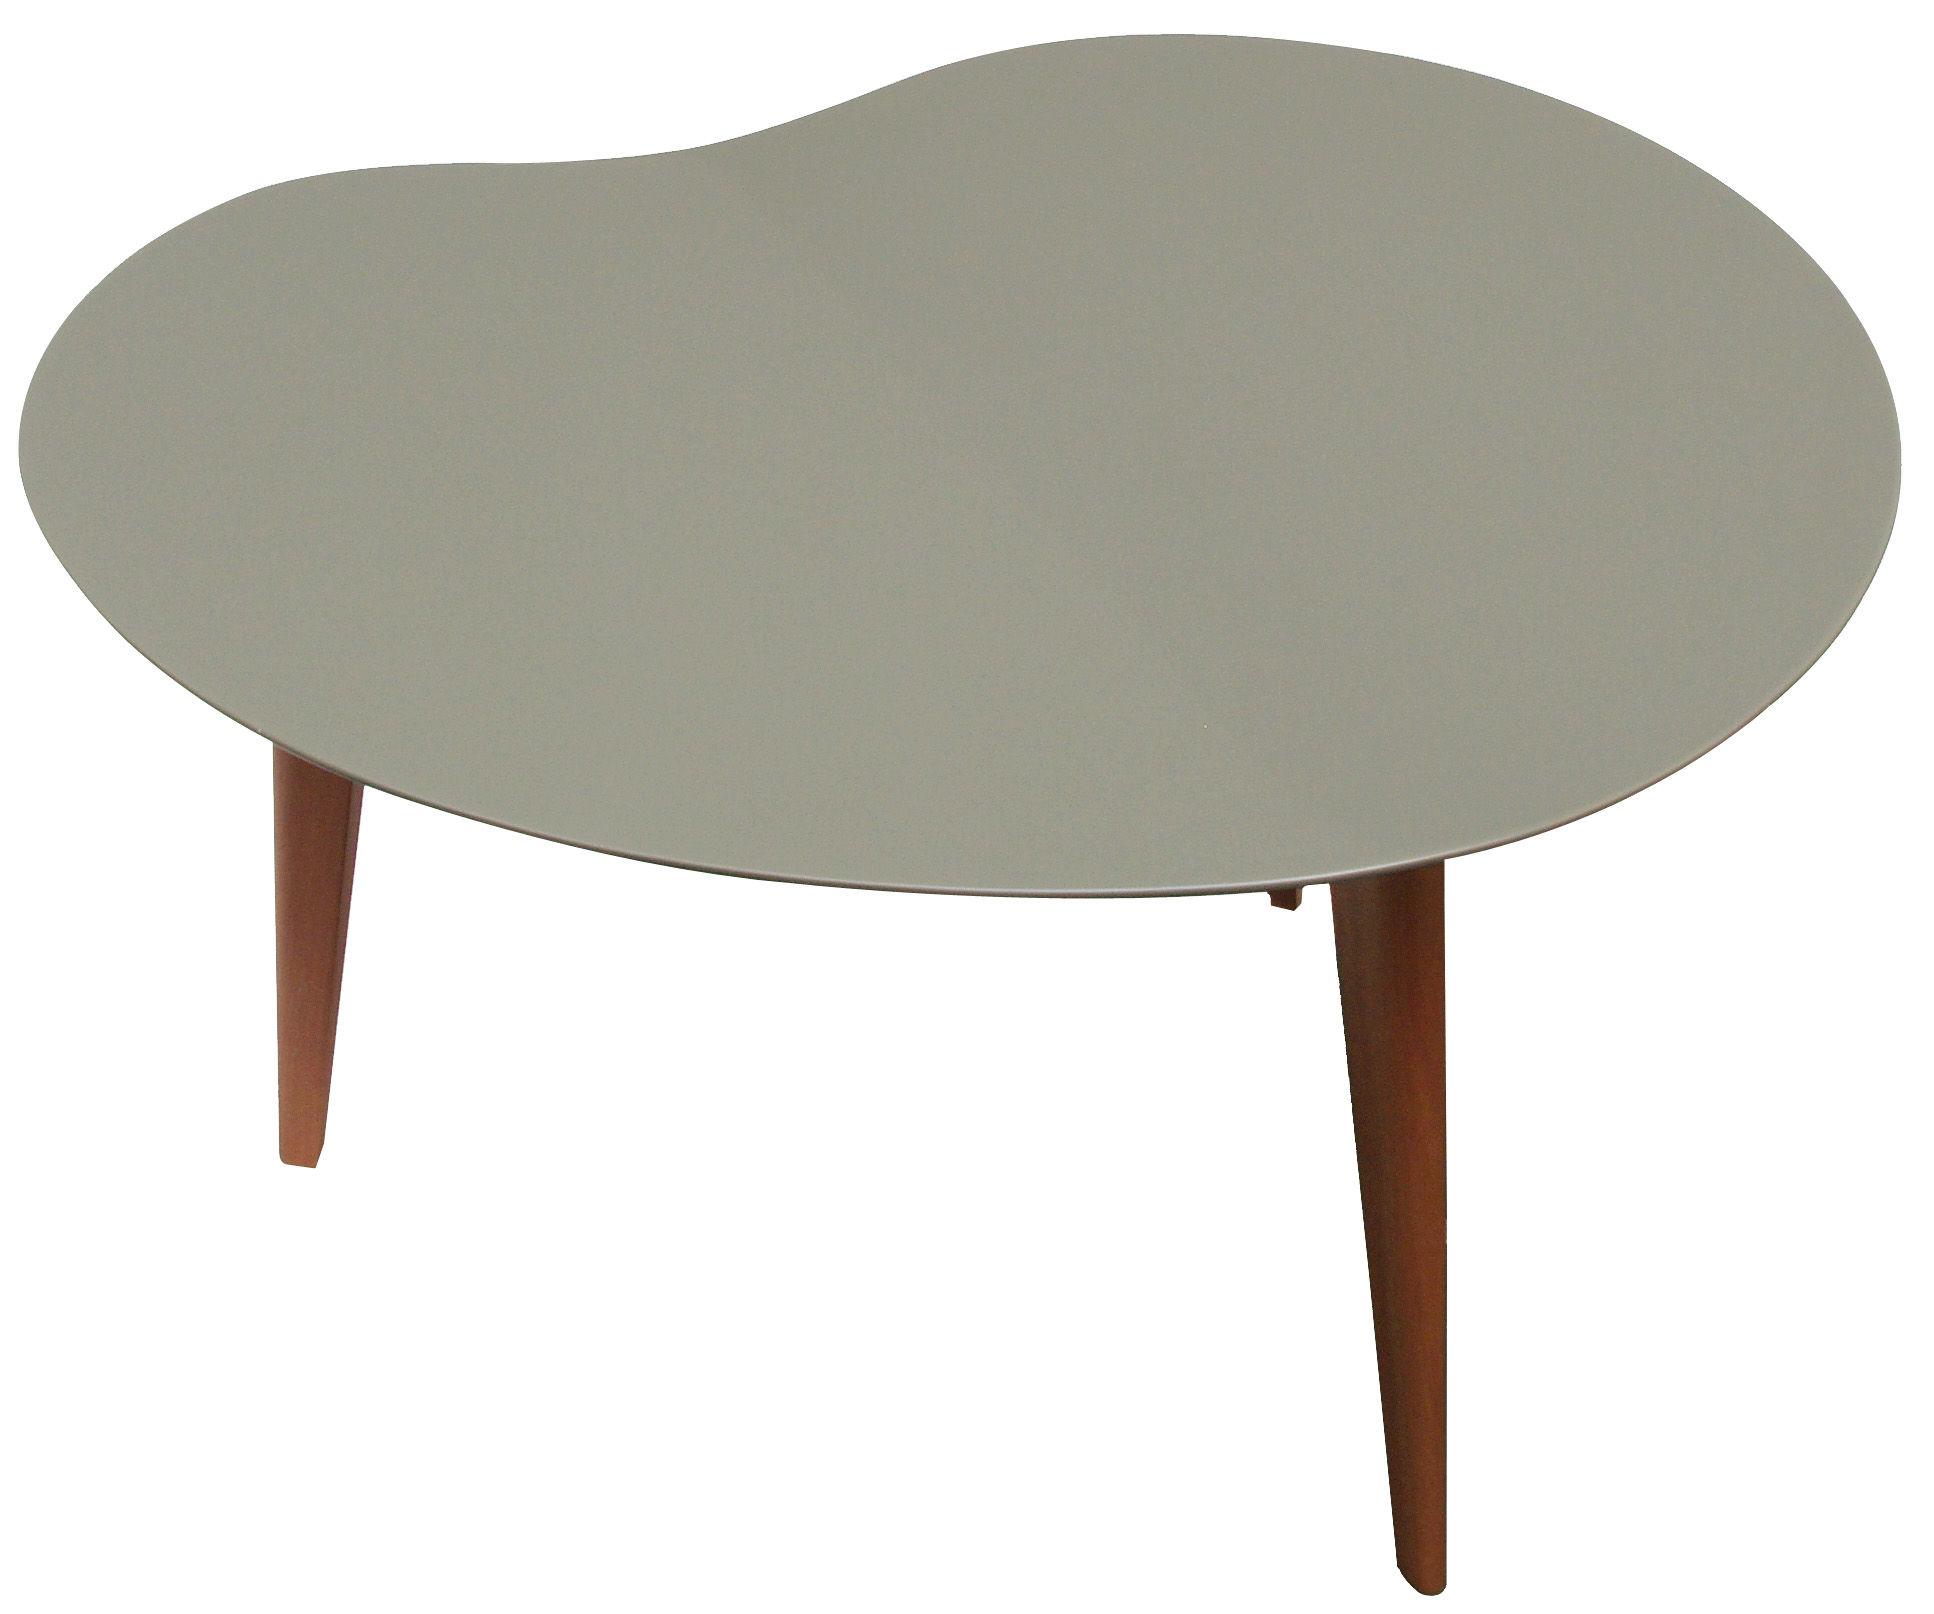 table basse lalinde haricot large gris pieds ch ne. Black Bedroom Furniture Sets. Home Design Ideas